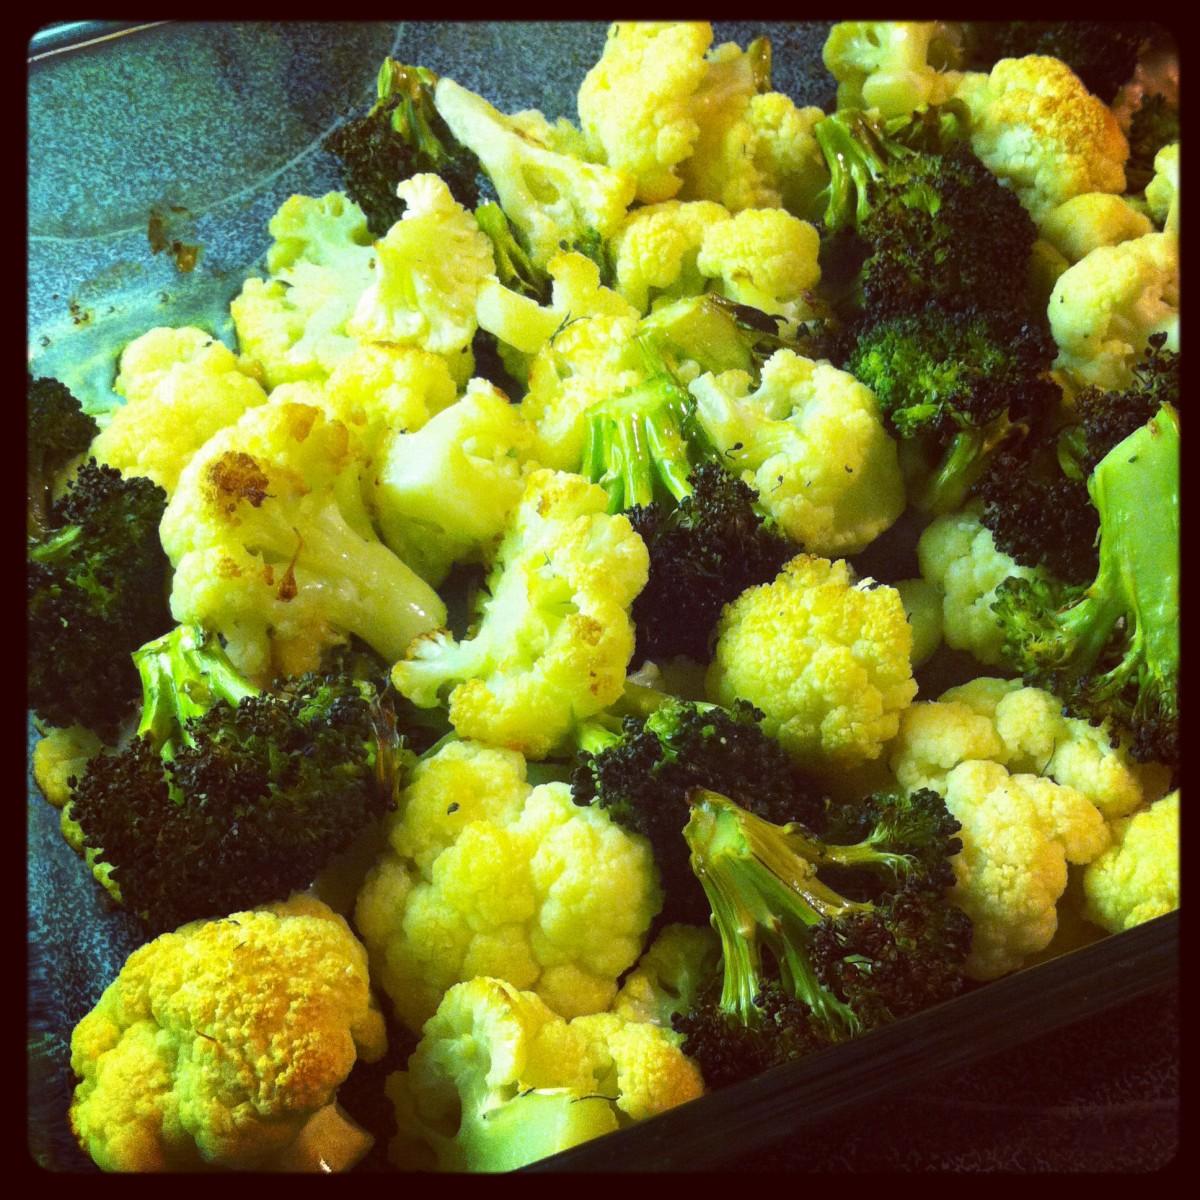 Kid-friendly broccoli and cauliflower.